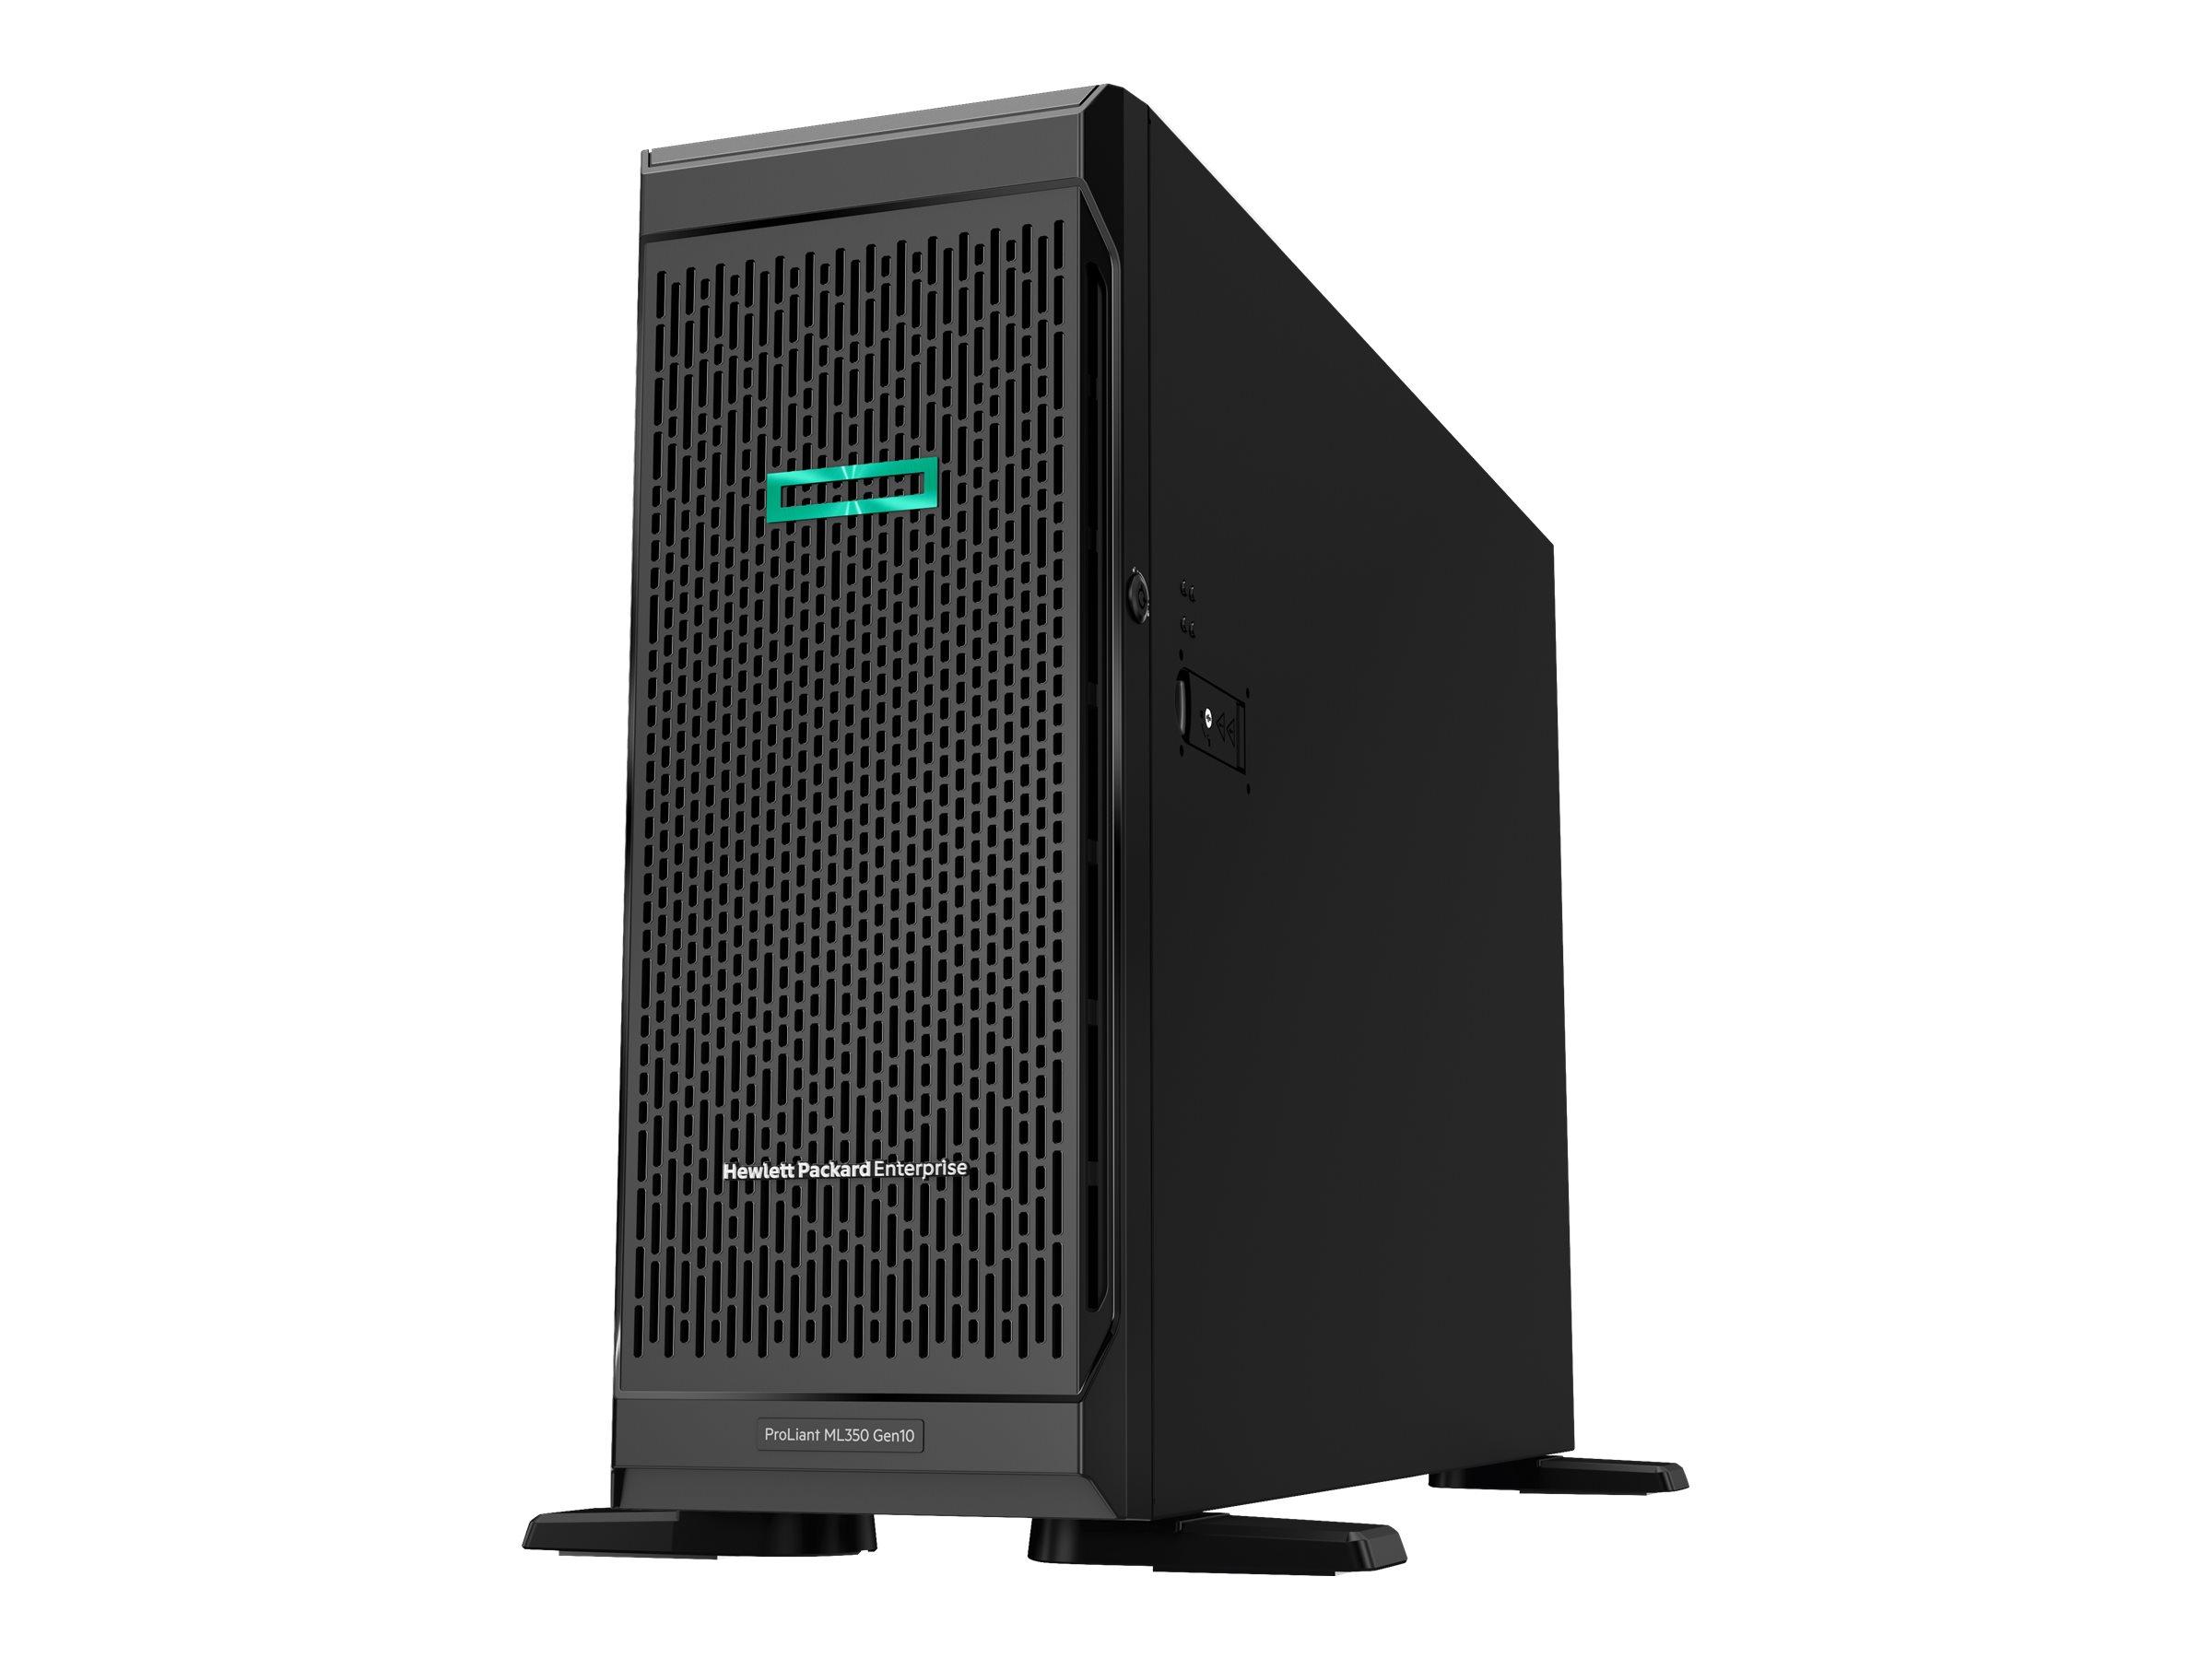 HP Enterprise ProLiant ML350 Gen10 Base - Server - Tower - 4U - zweiweg - 1 x Xeon Silver 4110 / 2.1 GHz - RAM 16 GB - S